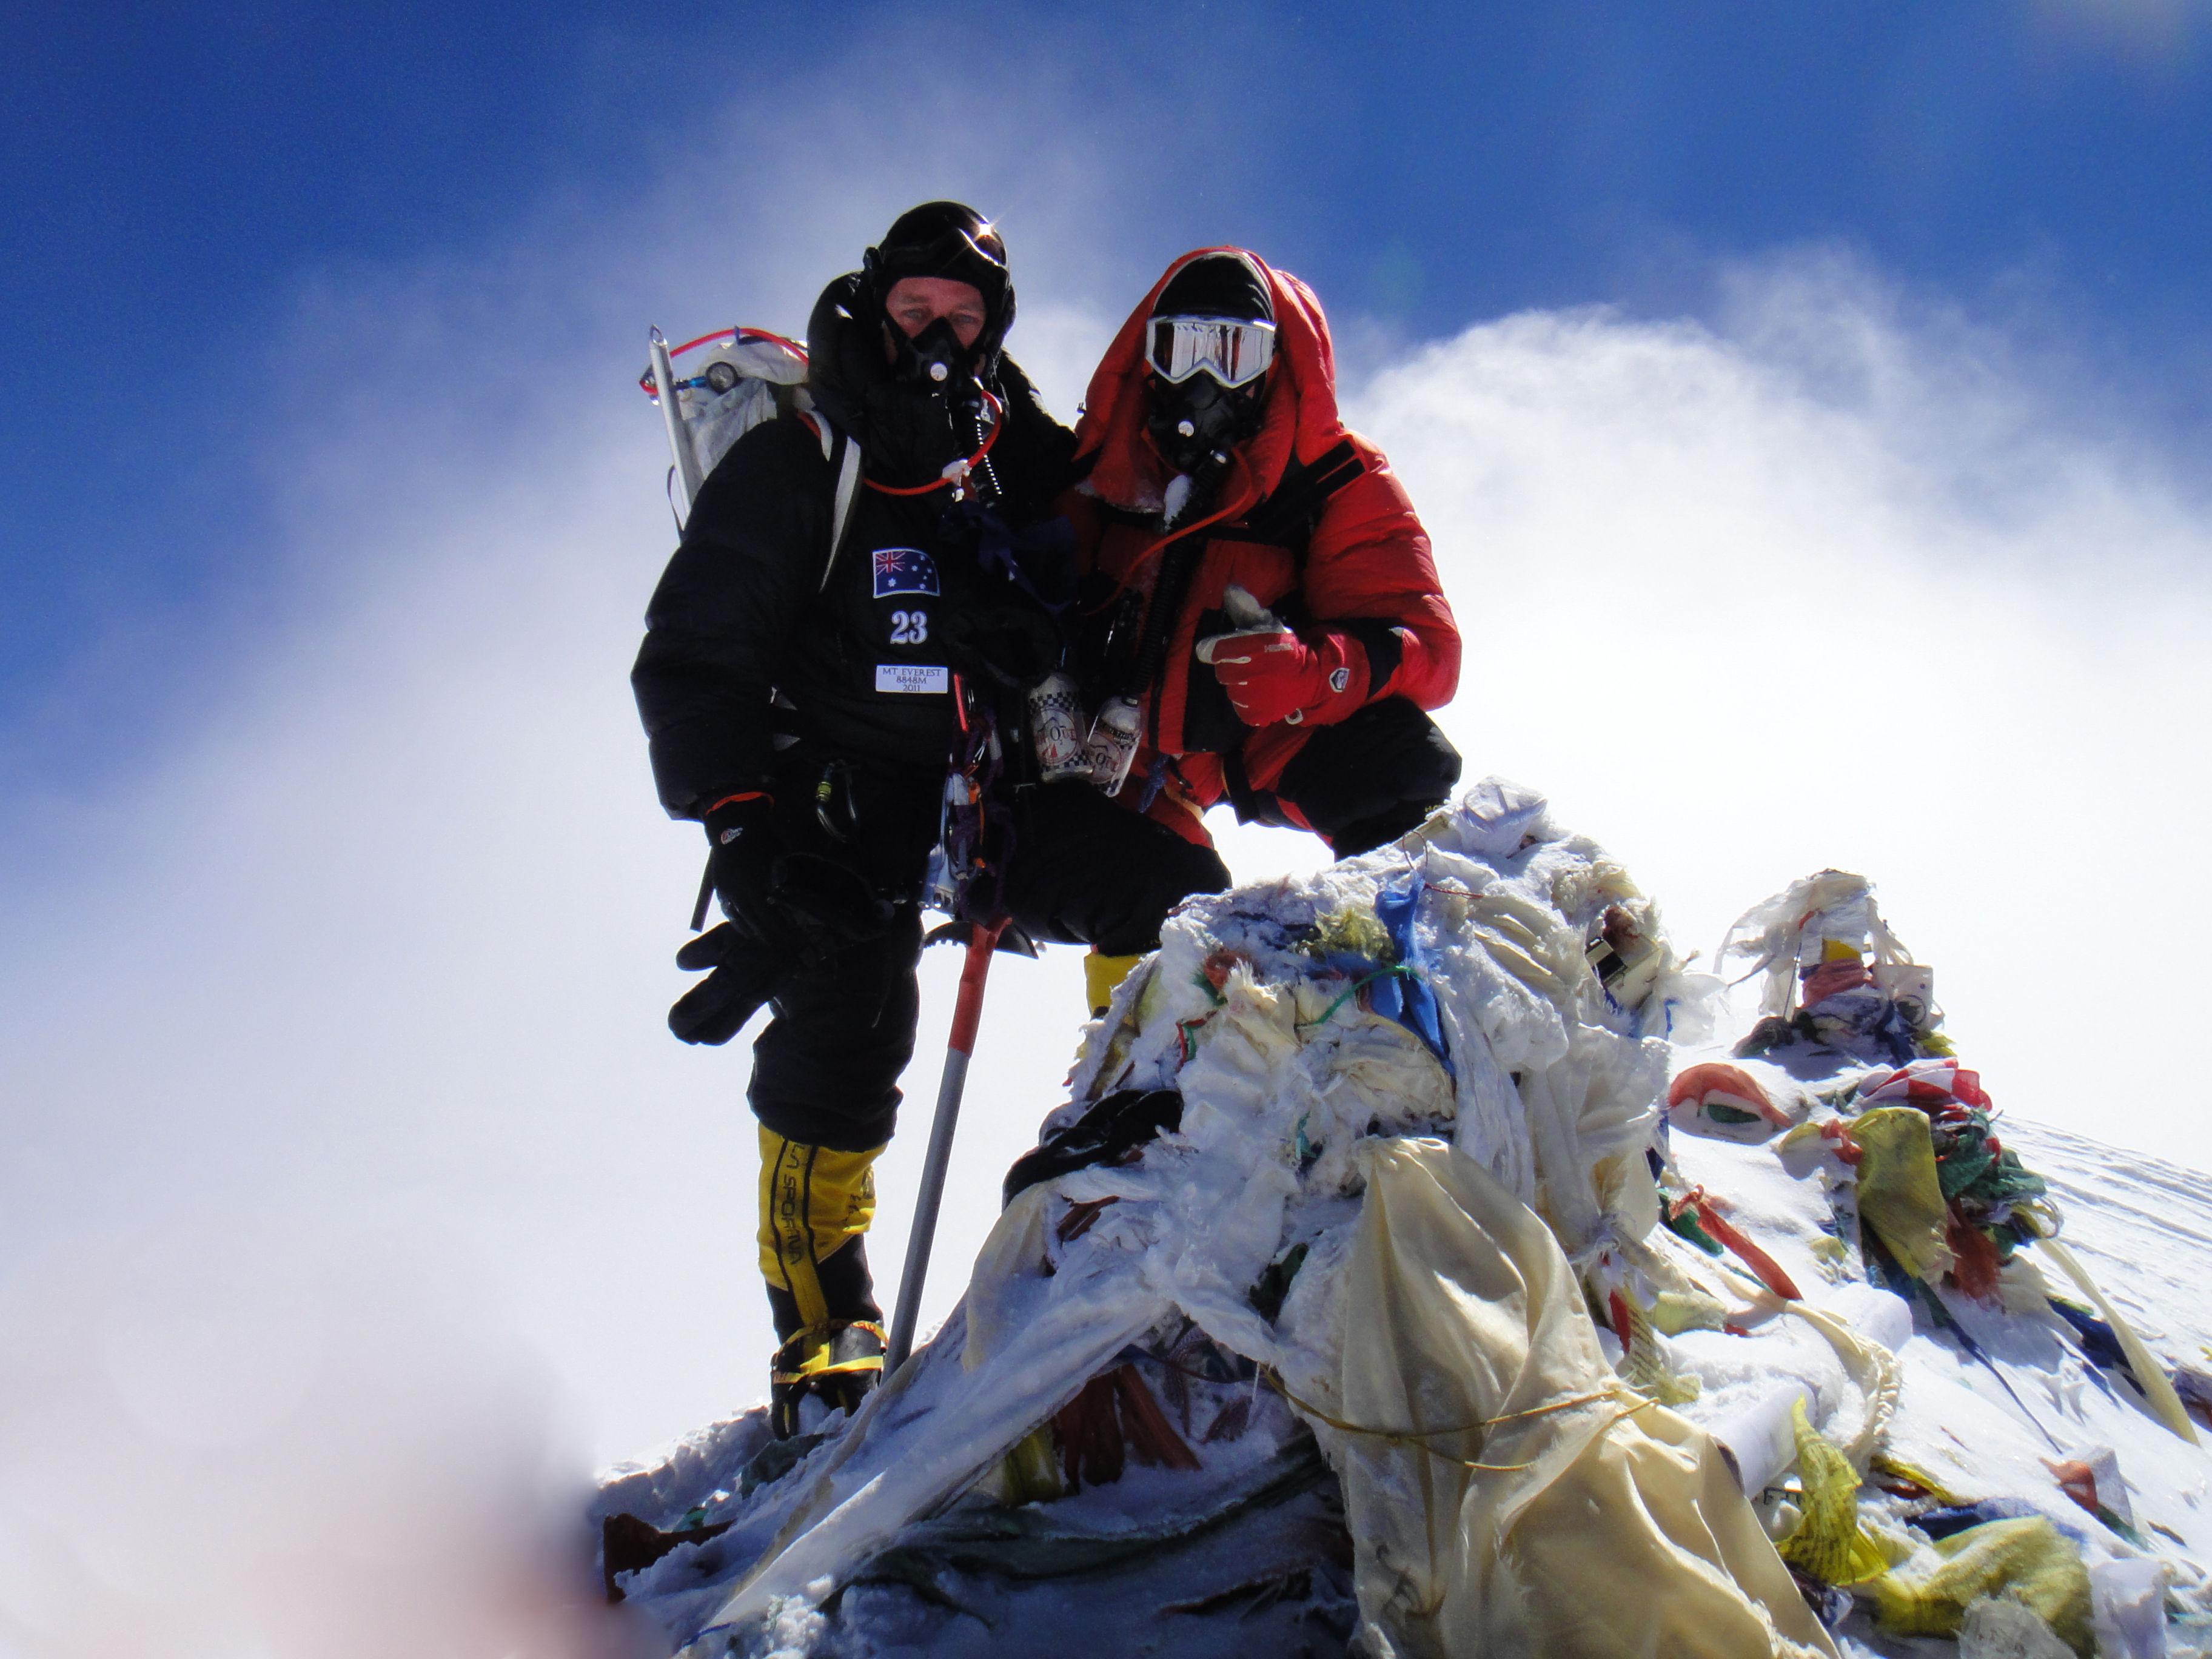 ¿De dónde recibe el nombrela montaña Everest?